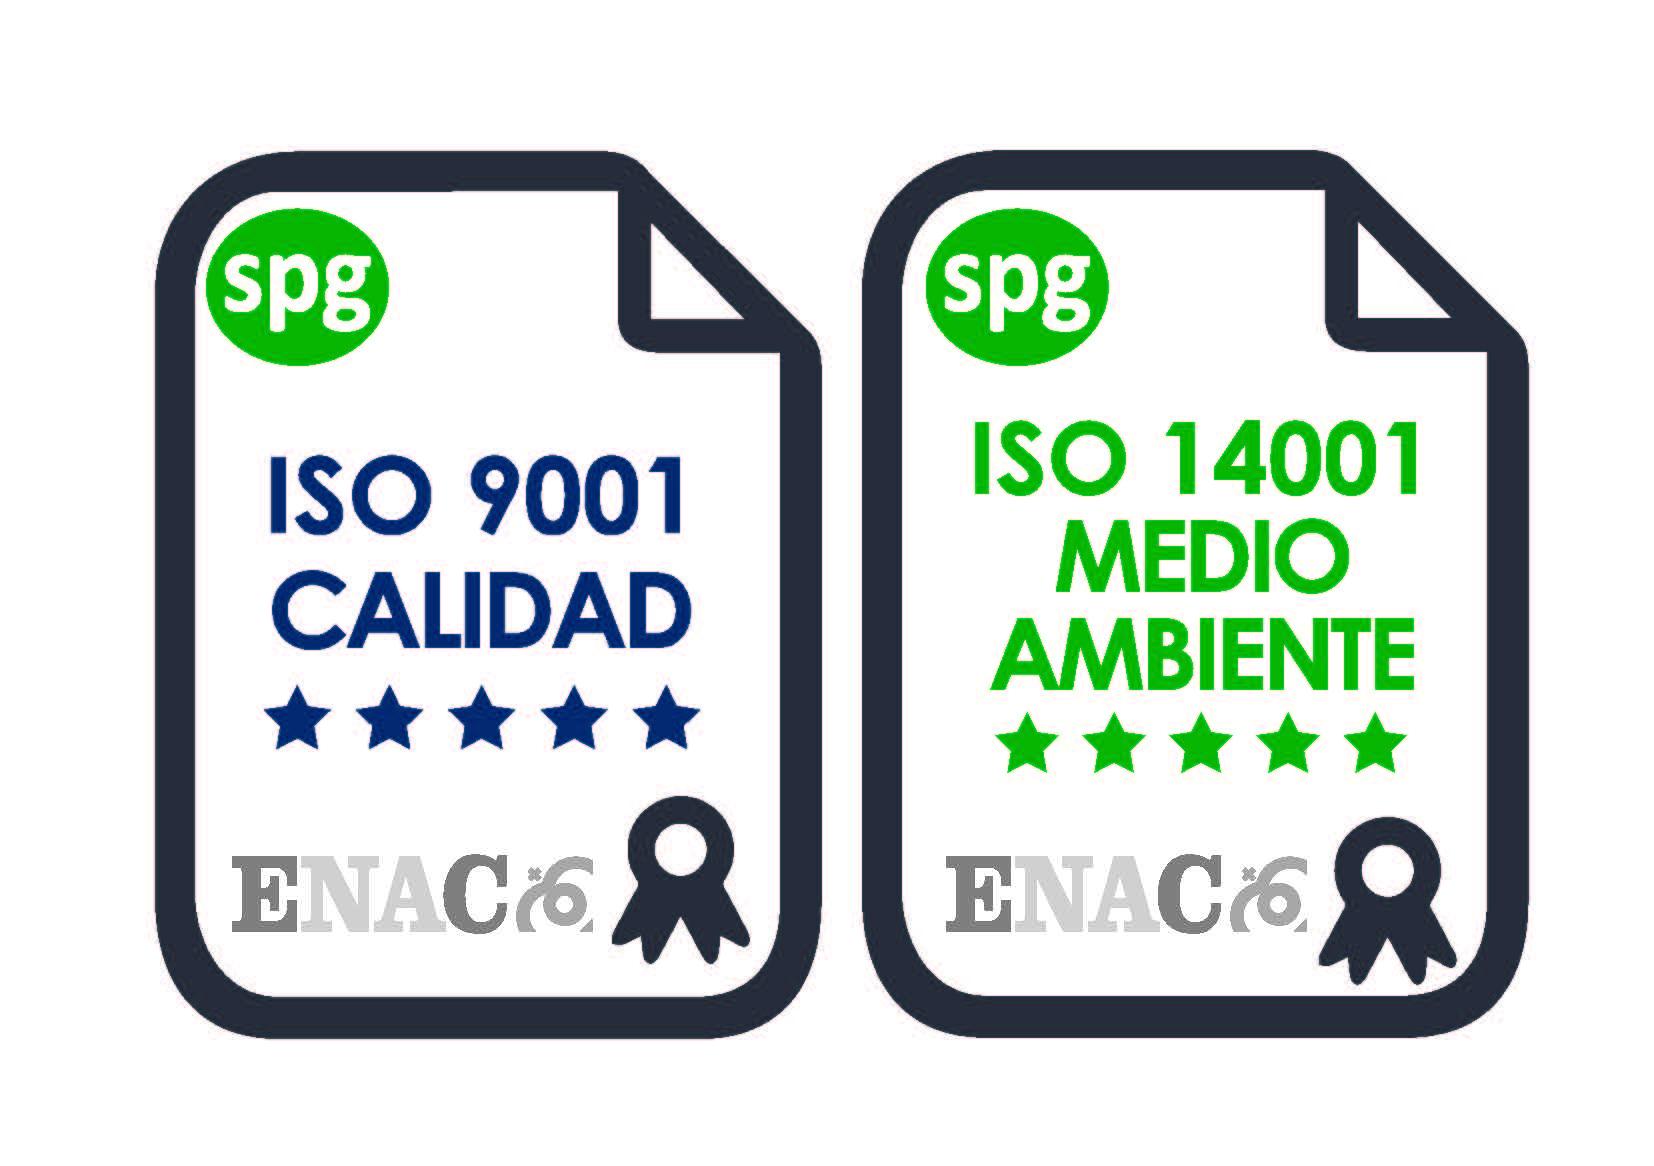 Logo_9001-14001_calidad_HK_LOGO ENAC_b&n